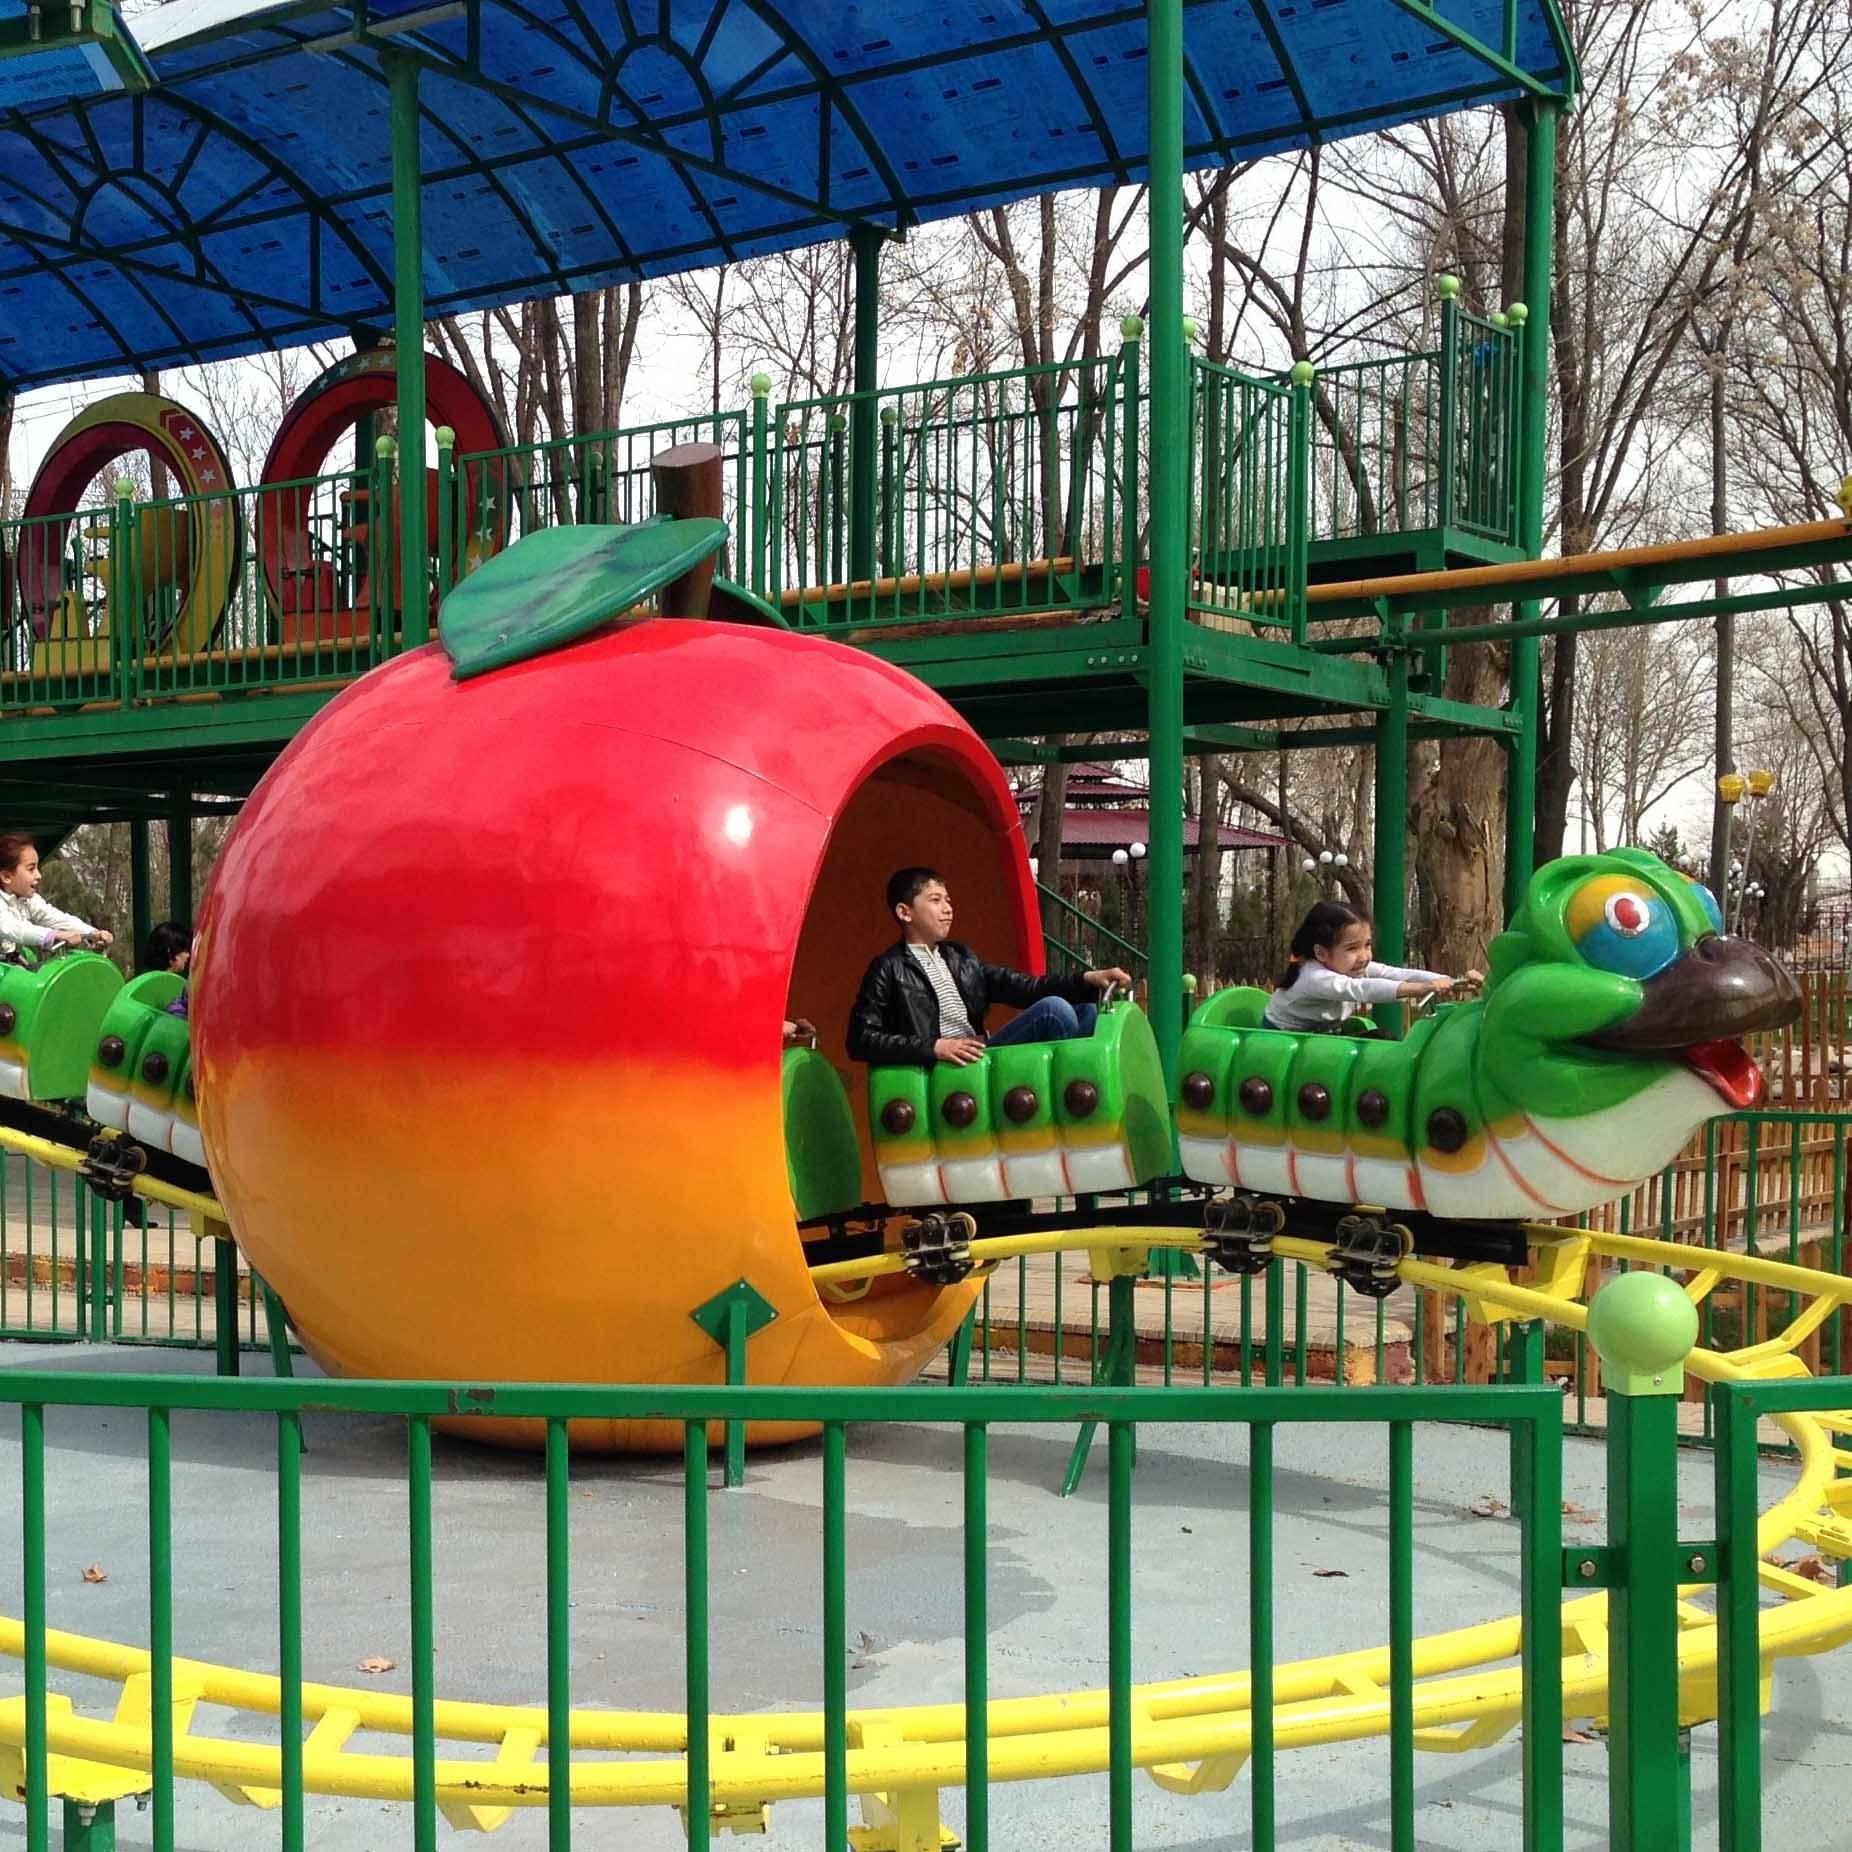 Kiddie Ride Fruit Worm Coaster Carnival Ride RHC-6B